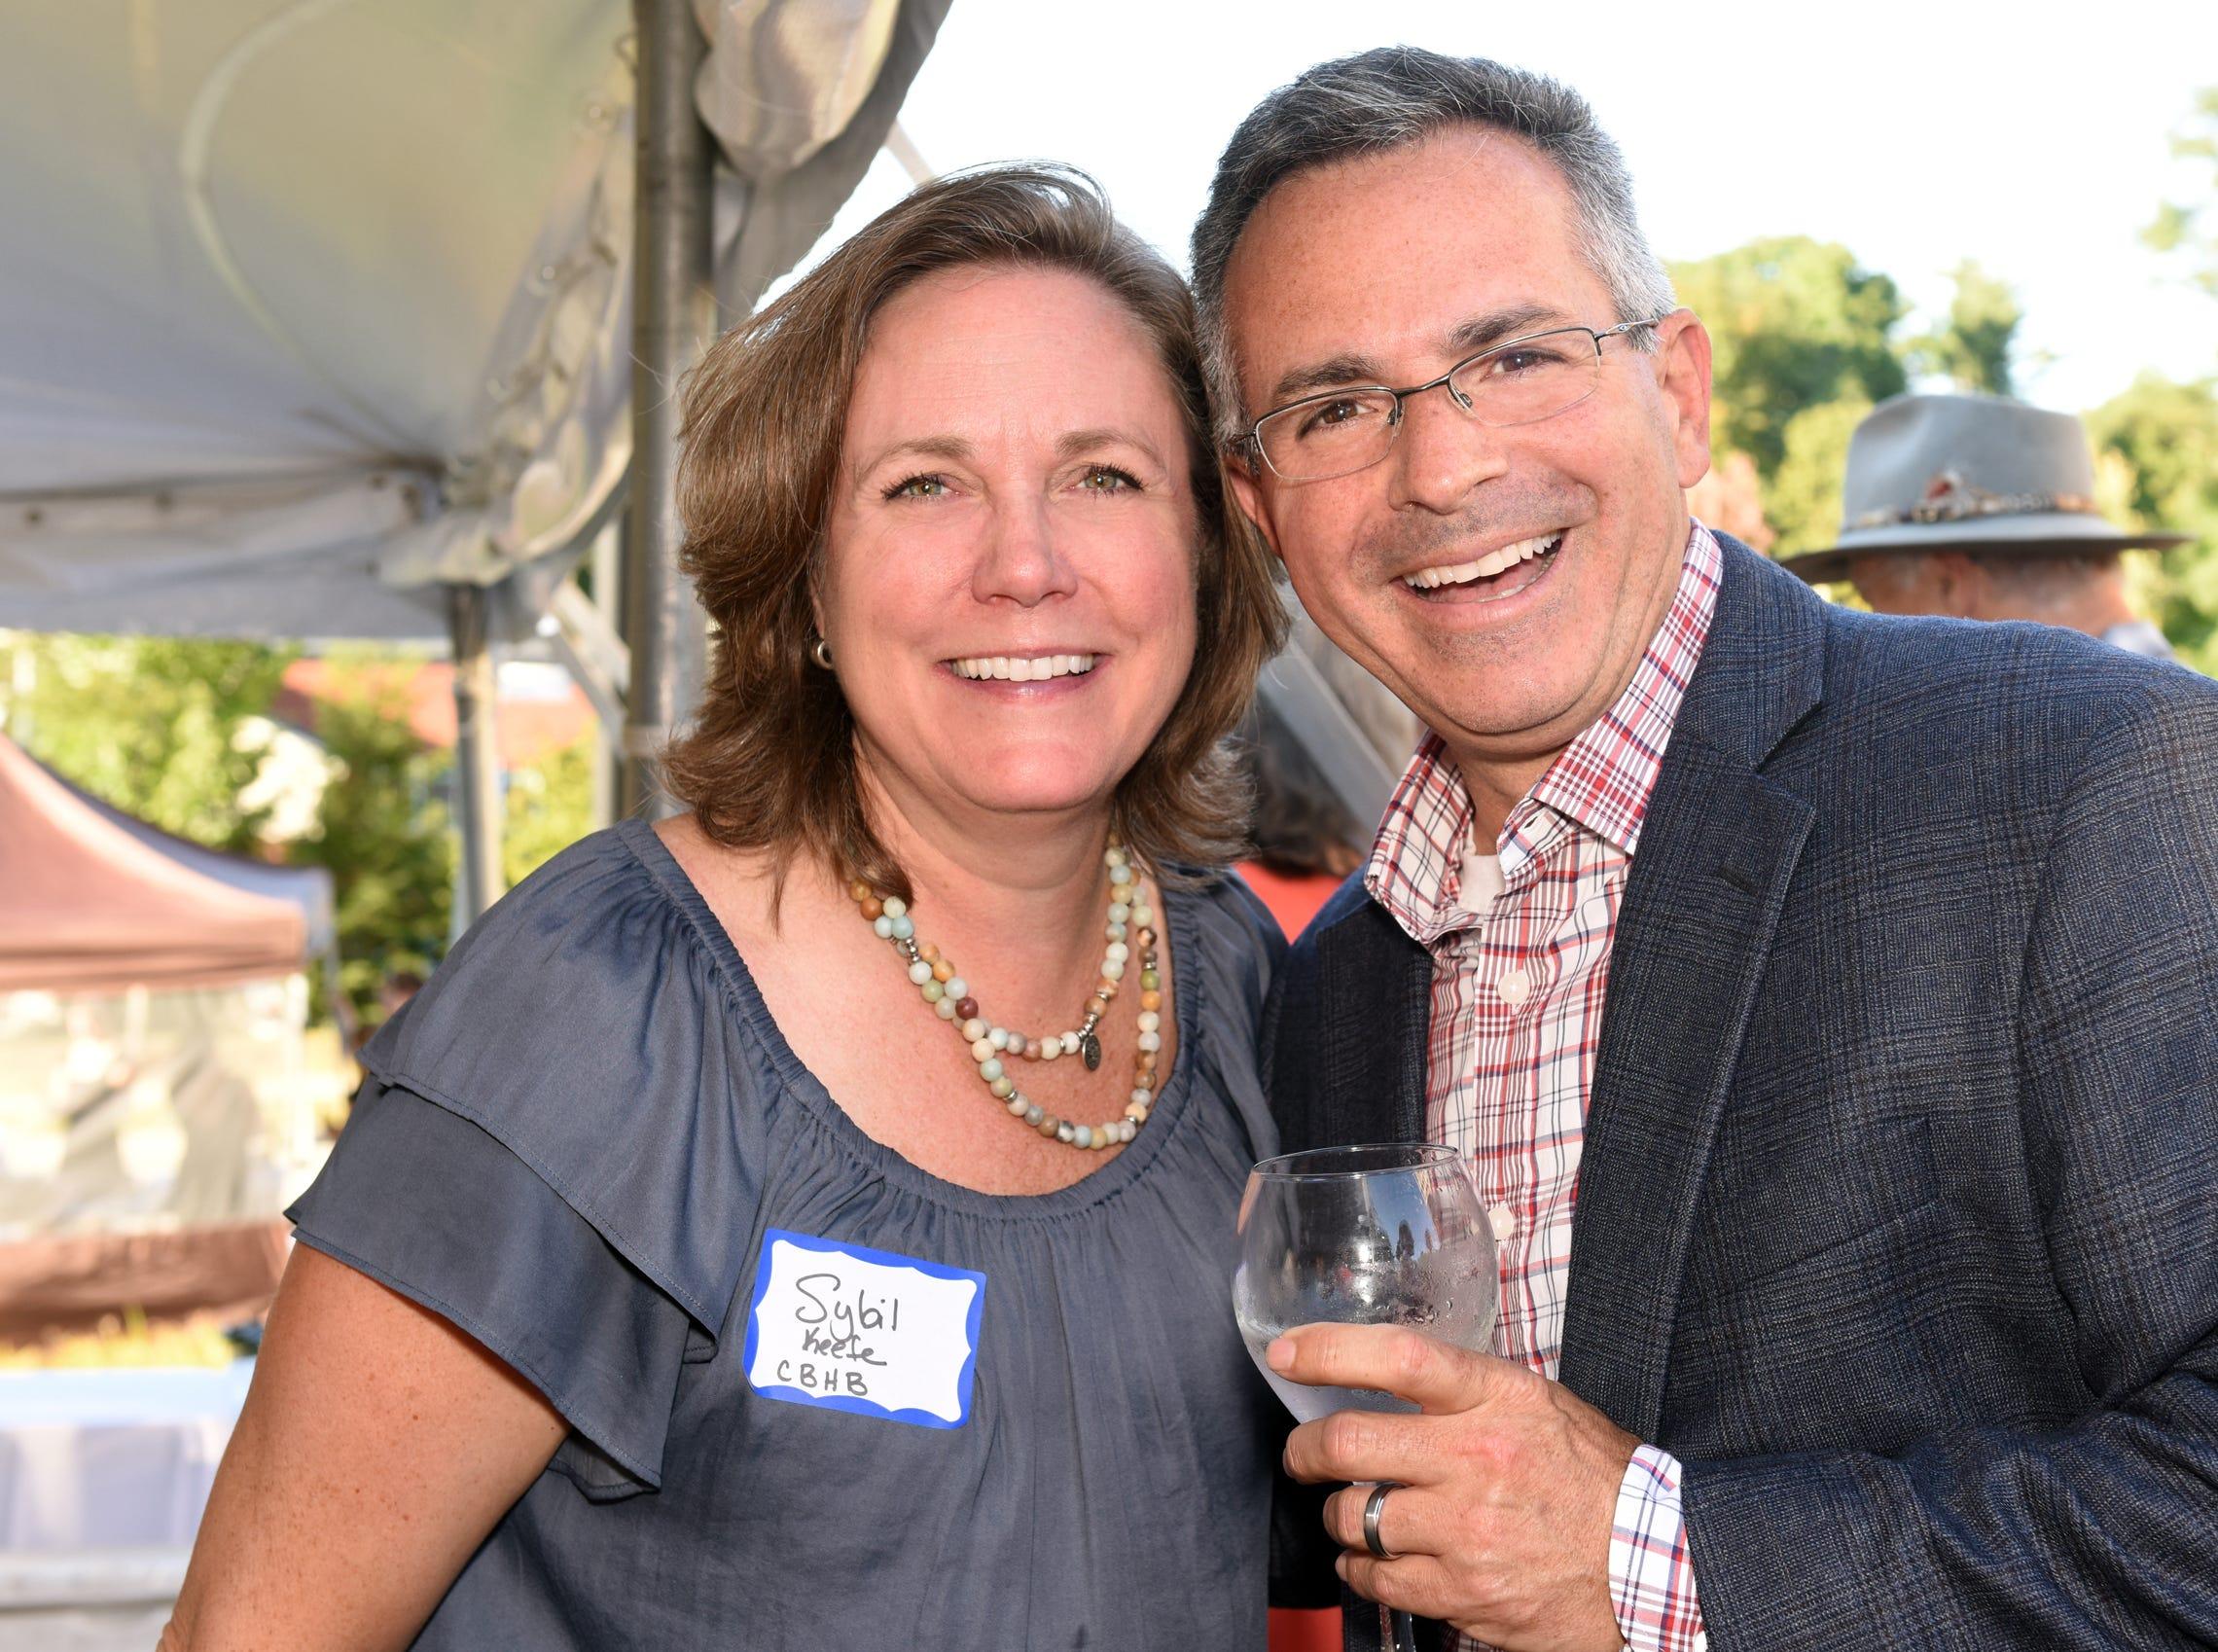 Sybil Keefe, director of marketing for Coldwell Banker Hickok & Boardman Realty, poses with Burlington Free Press President Jim Fogler at Hickok & Boardman's 60th anniversary celebration on Sept. 13, 2018, in Burlington.